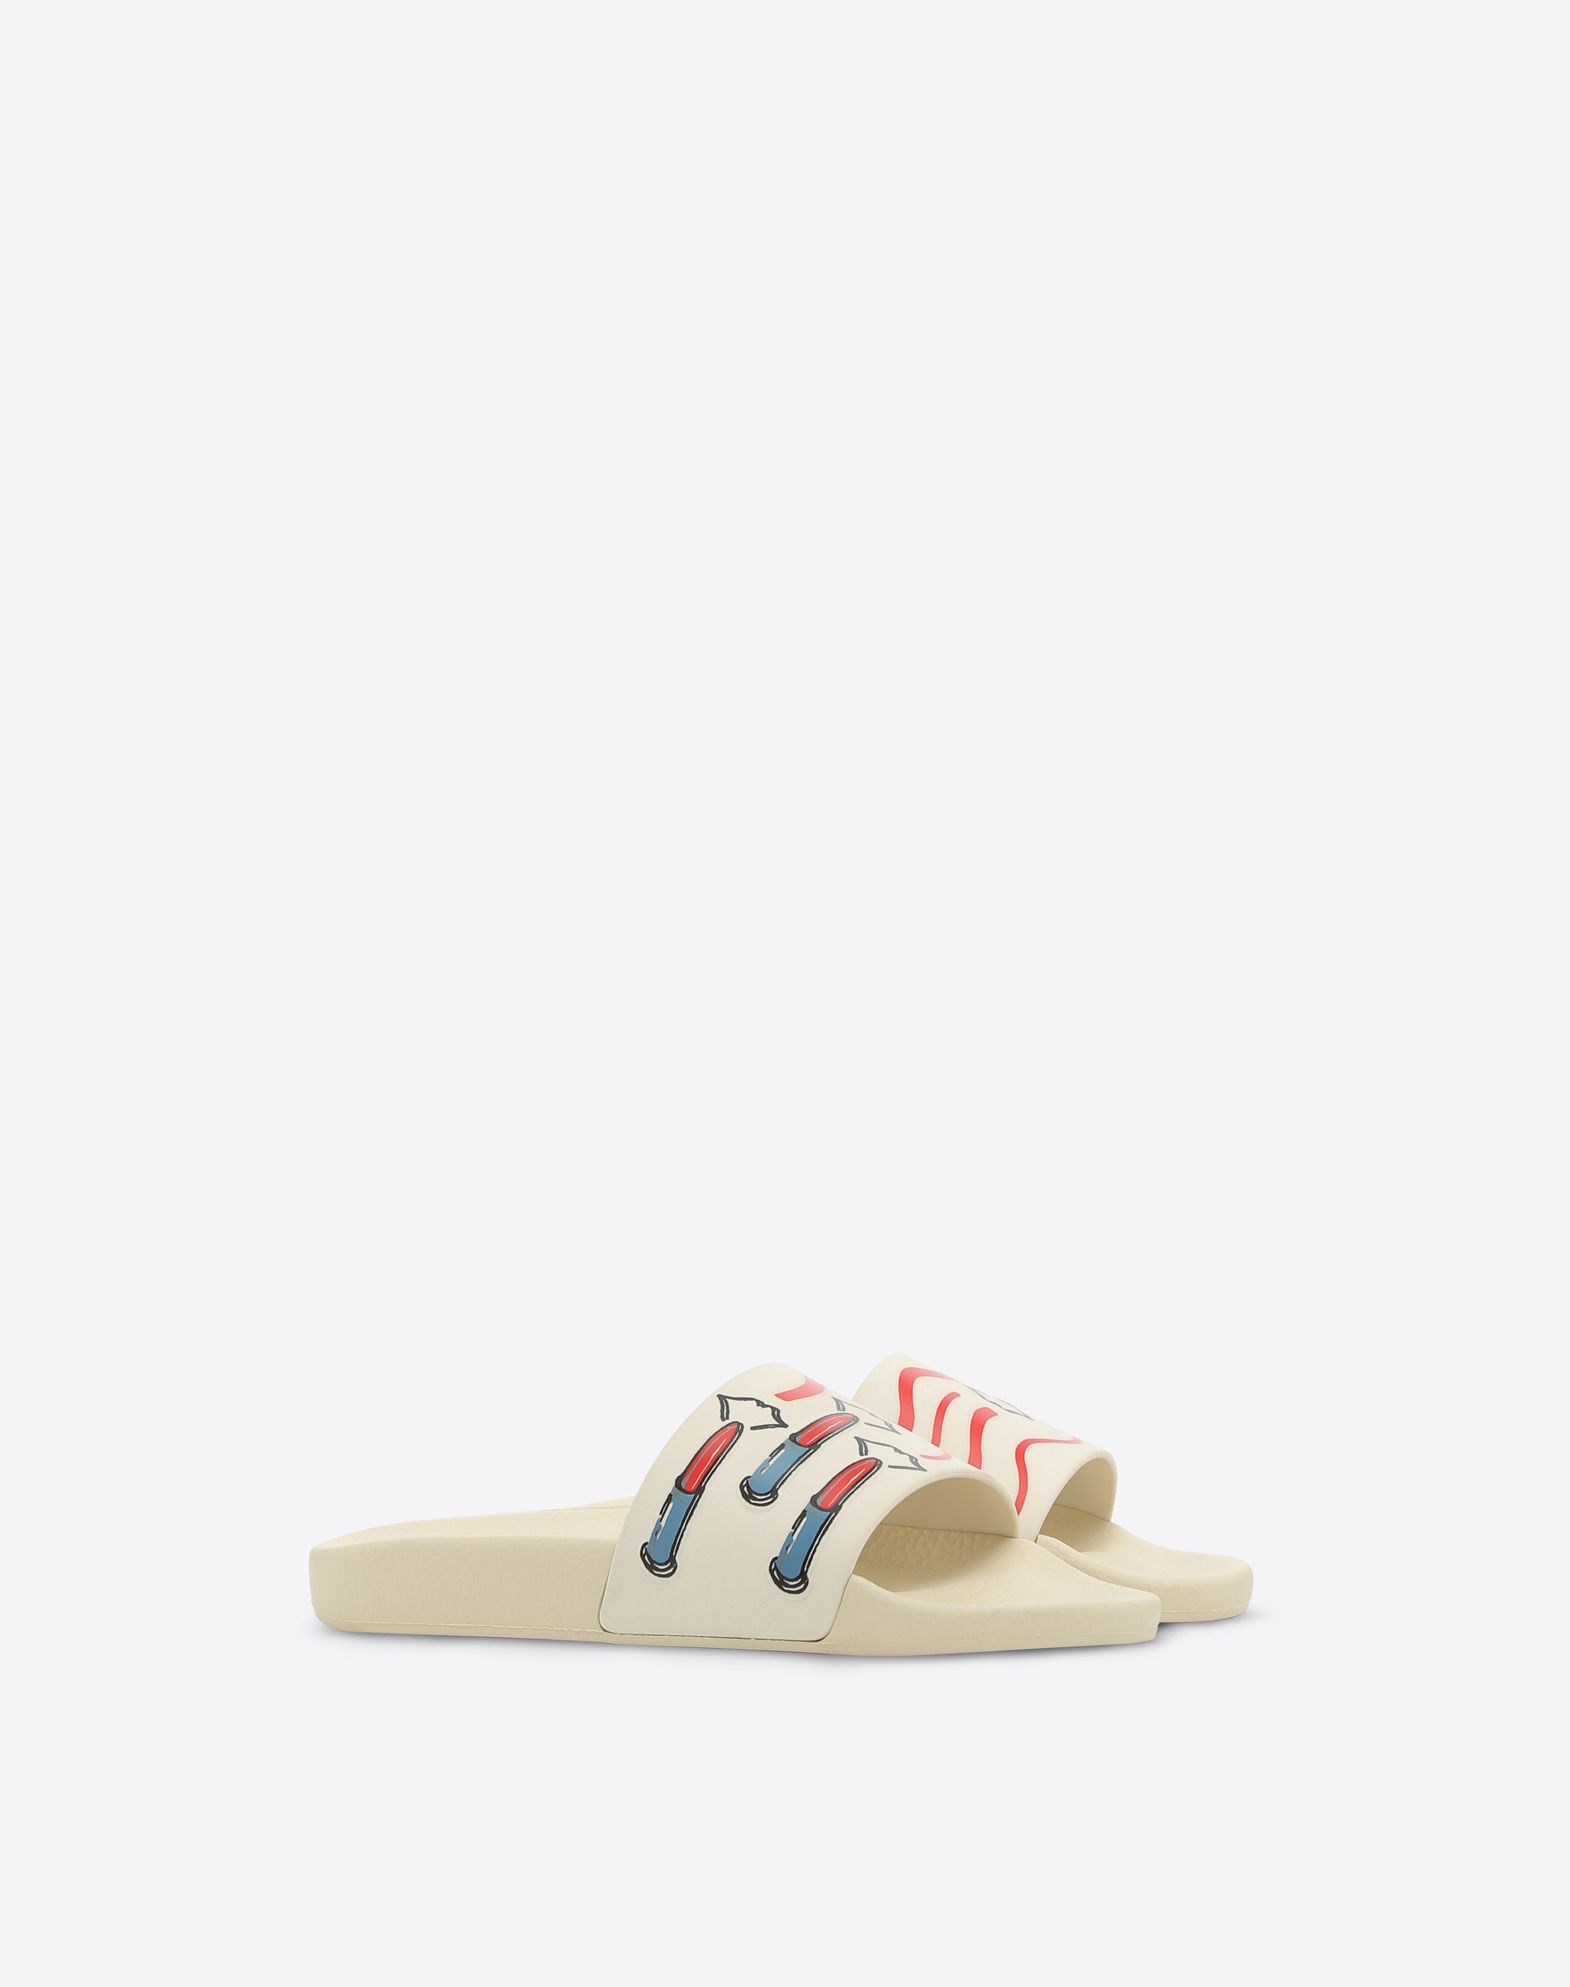 VALENTINO GARAVANI 口红印纹 PVC 拖鞋式凉鞋 拖鞋式凉鞋 D r